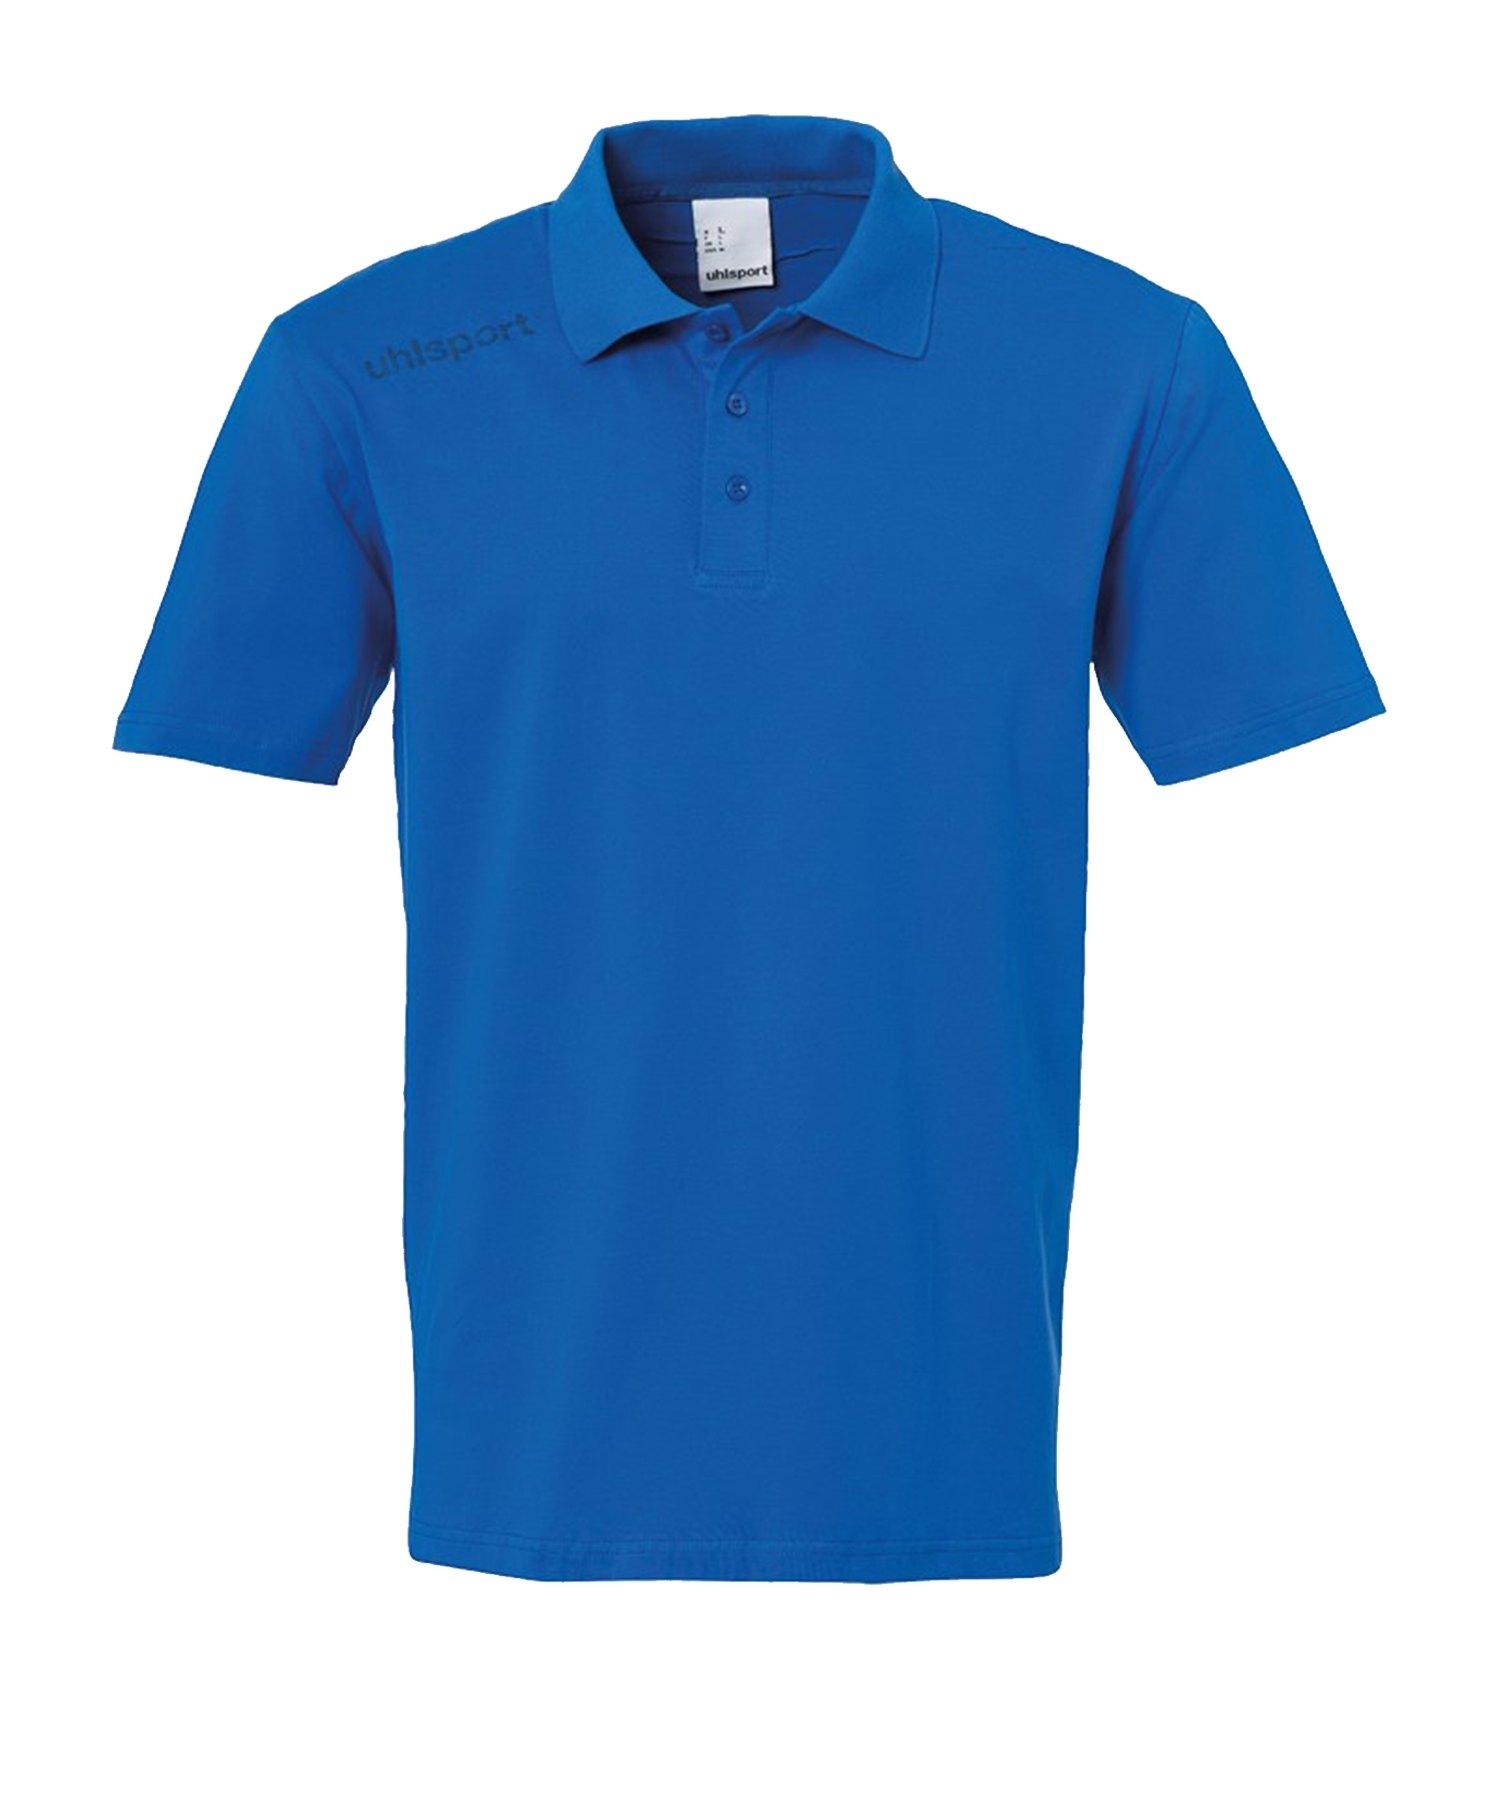 Uhlsport Essential Poloshirt Blau F03 - Blau